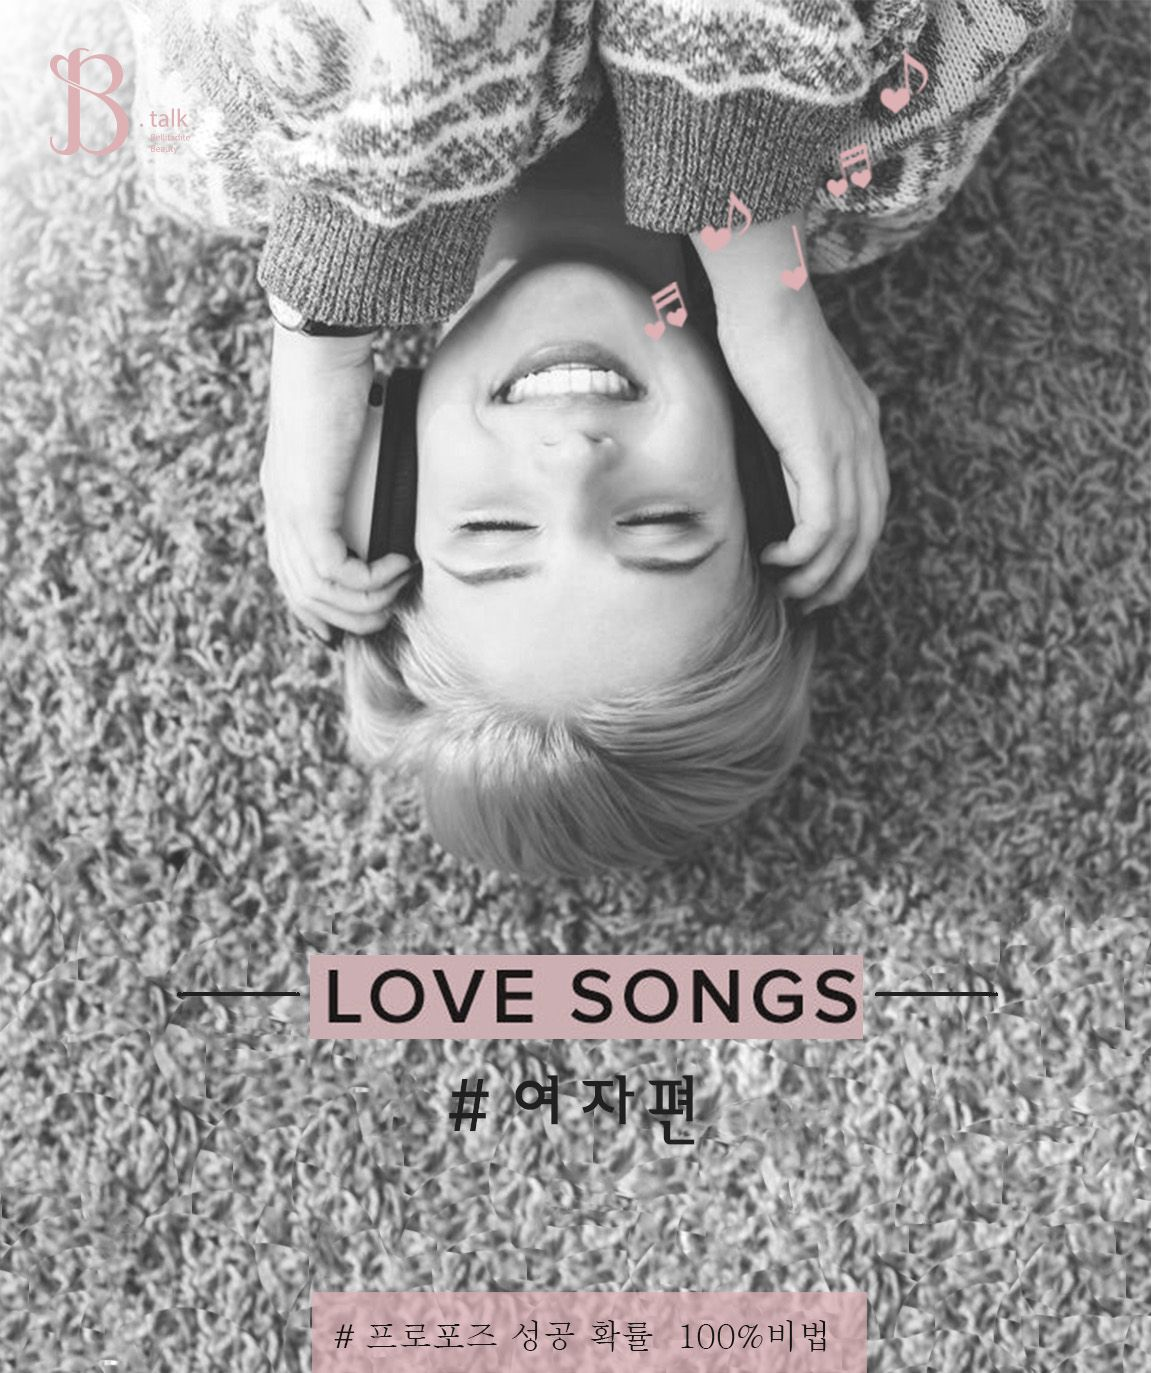 [B talk]# 프로포즈 성공 확률 100% 비법[love song 여자편] 지난 번에 B talk에서 소개되었던 Love Song 남자편에 이어 오늘은 Love Song여자편을 소개해볼까 합니다. #가을 #11월 #프로포즈 #노래 #고백 #사랑 #결혼 #로맨틱 #감성 #프리미엄 #주얼리 #미러 #벨리타디테